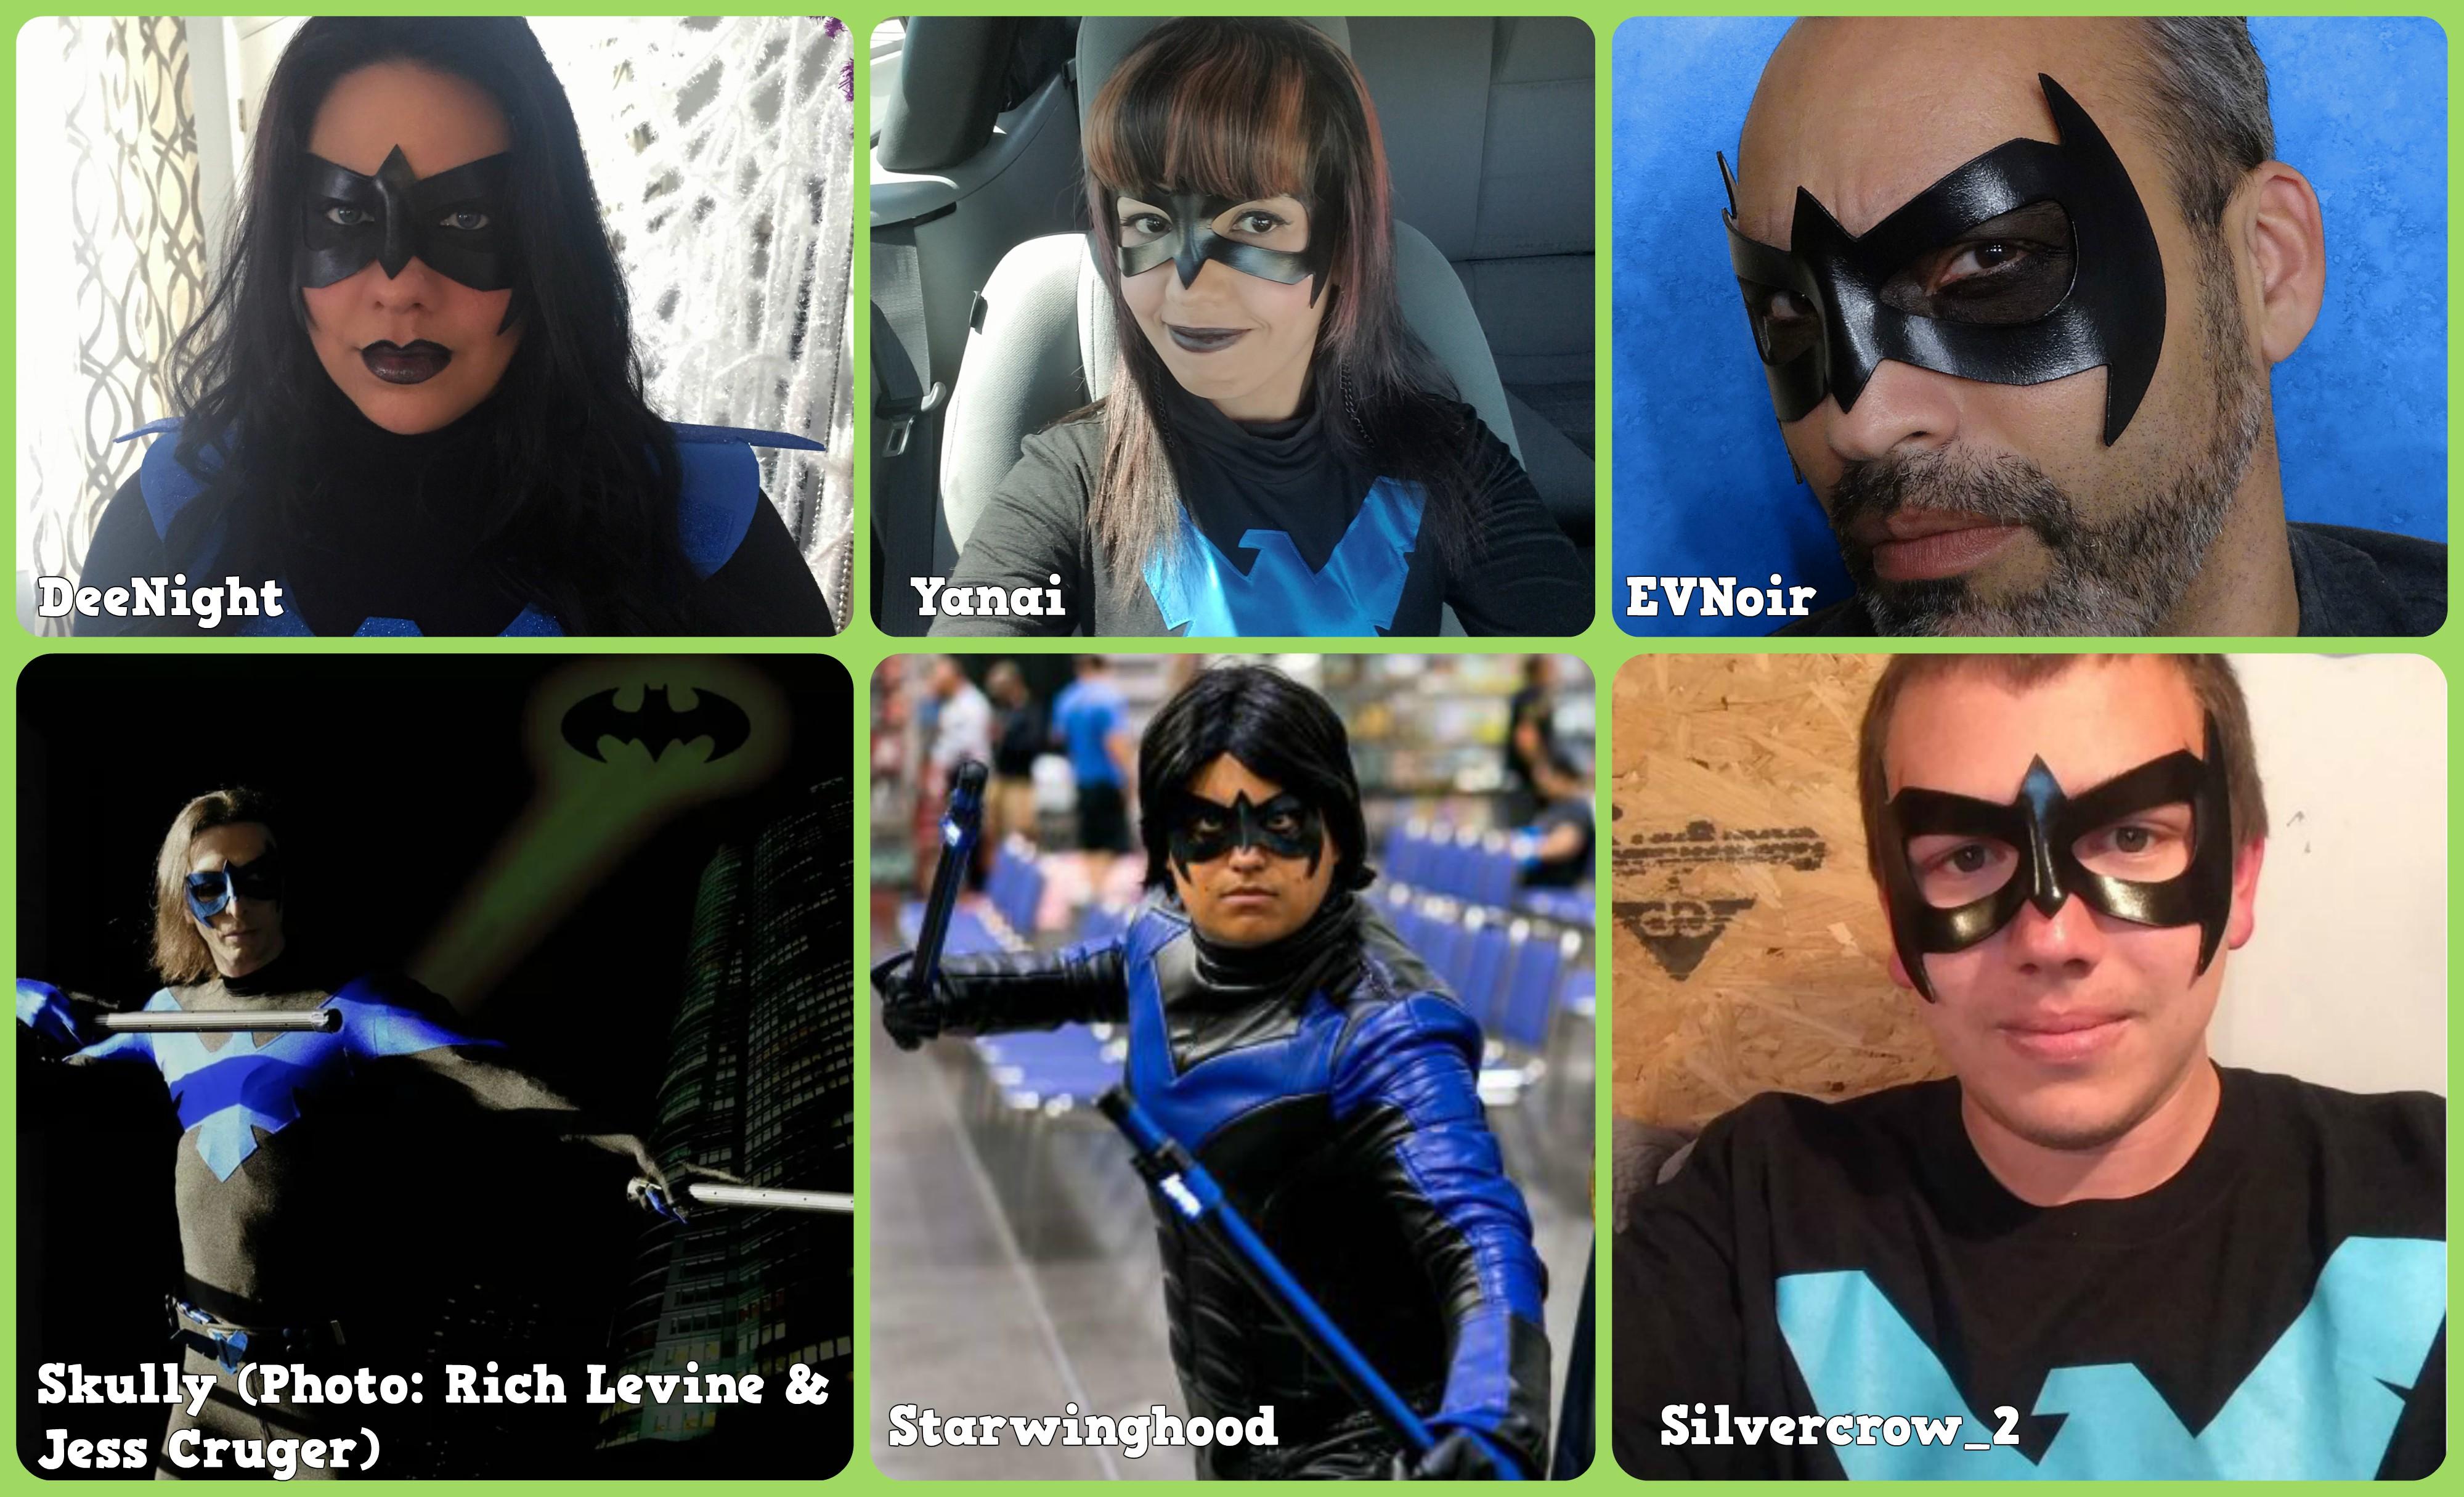 nightwing-mask-cosplay-collage.jpg